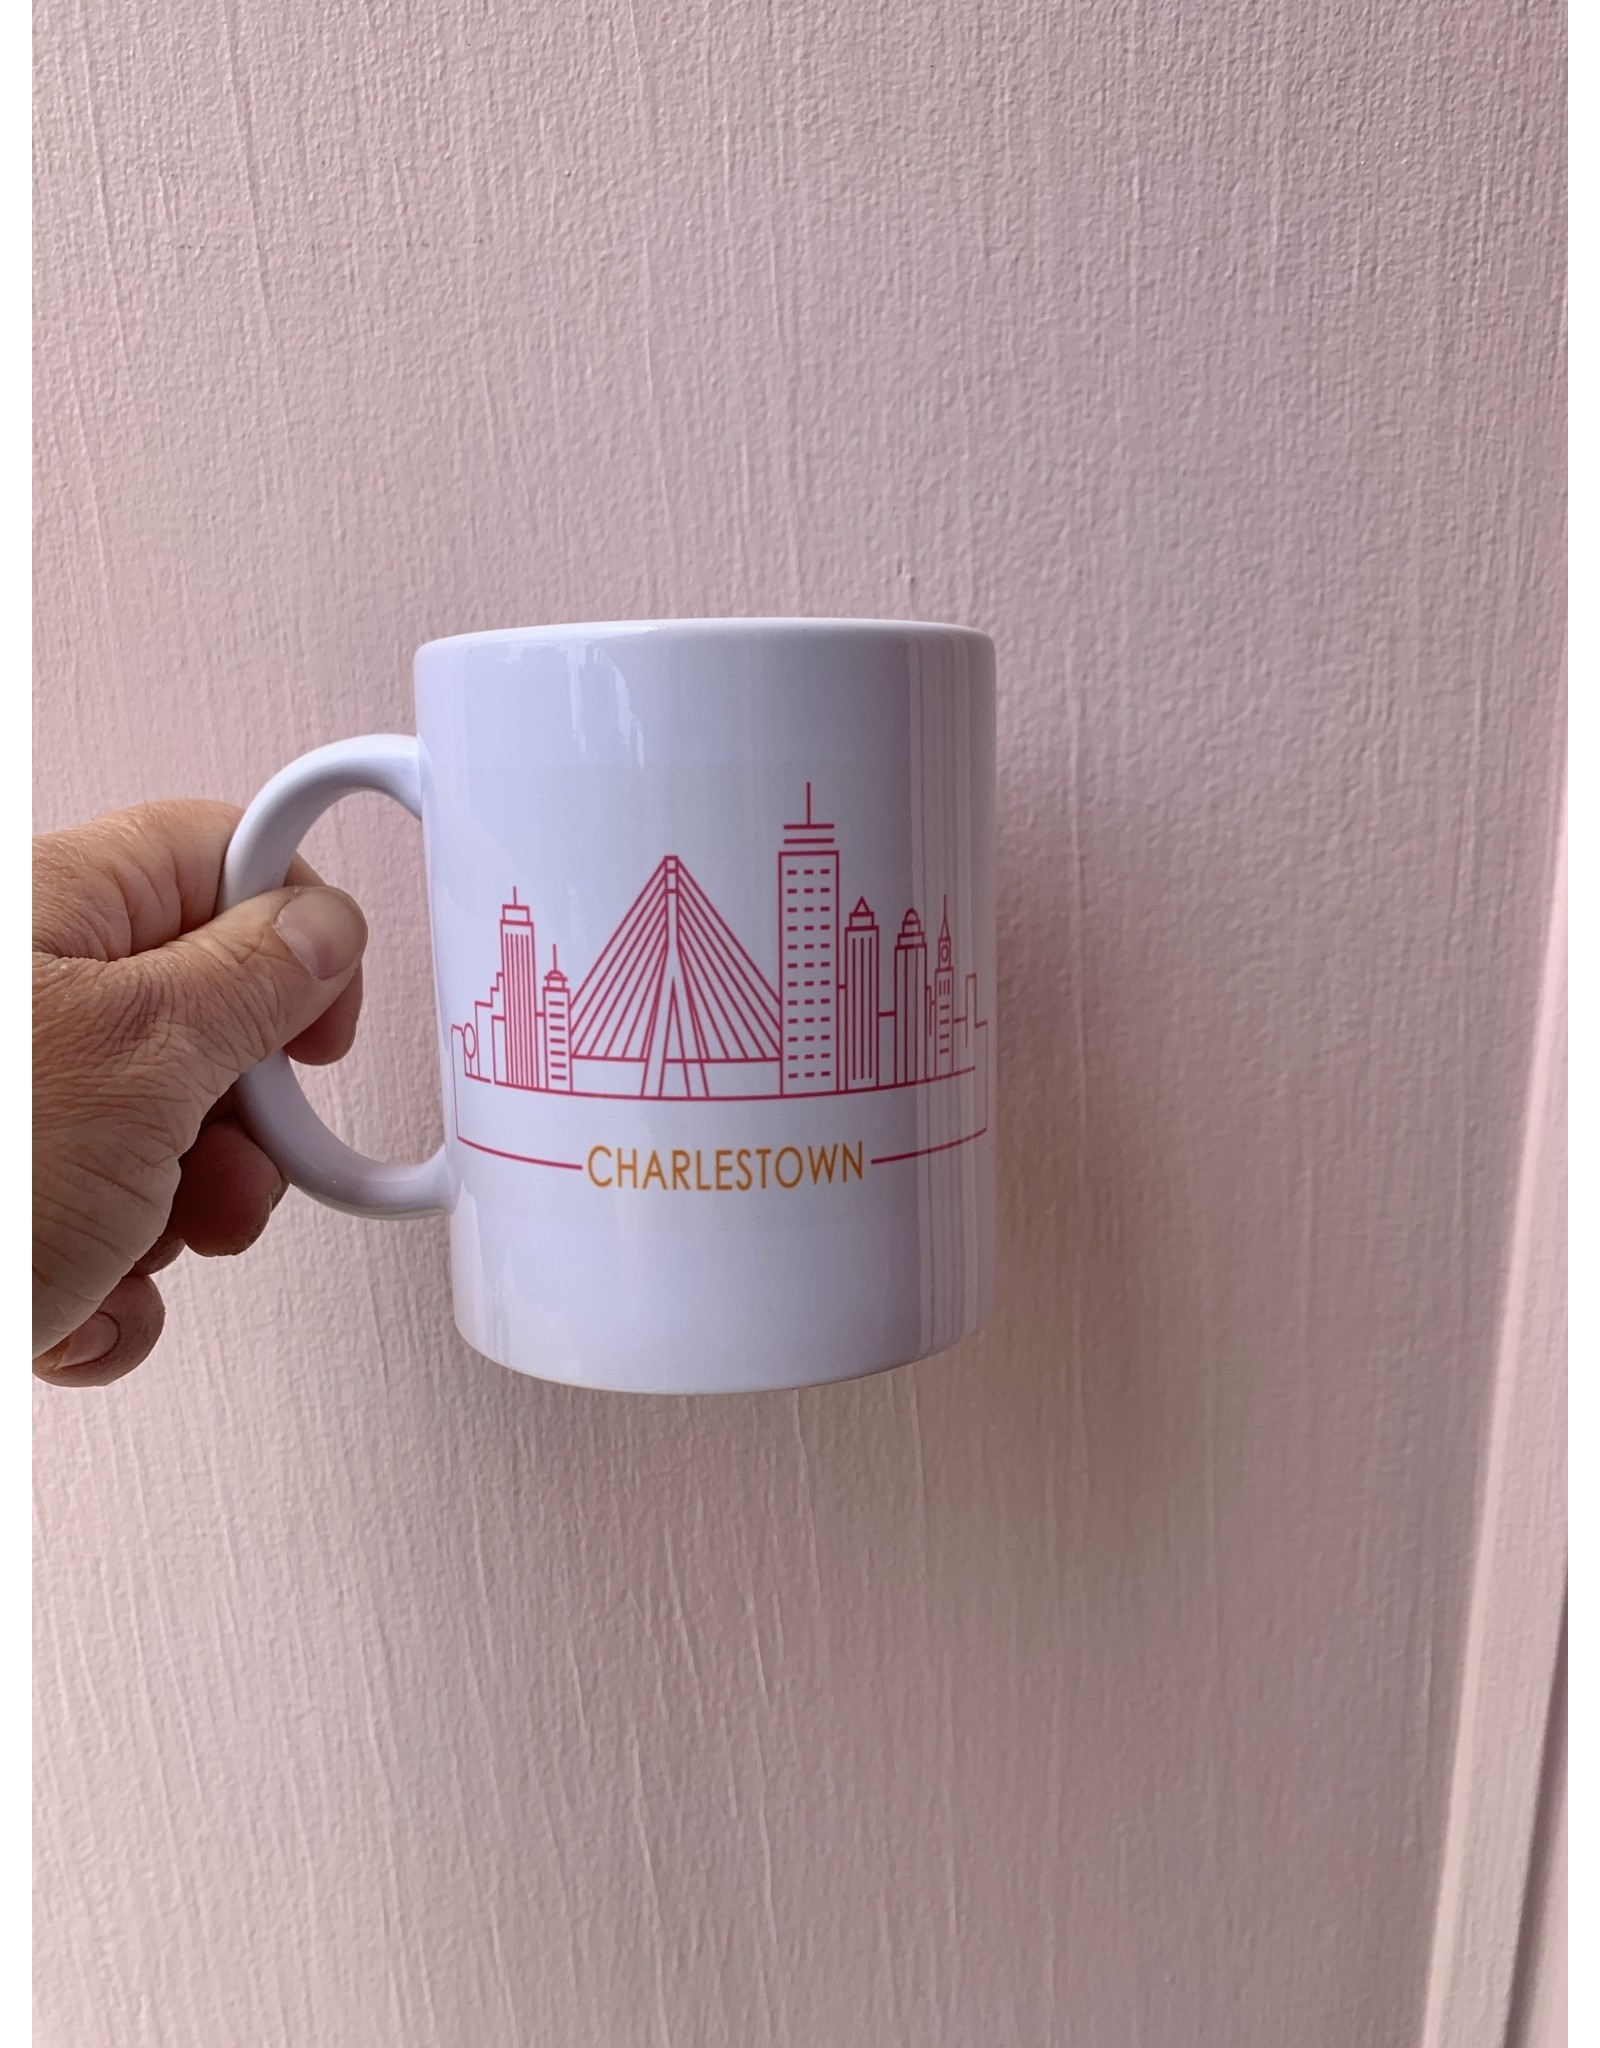 Charlestown Skyline Mug in Pink and Orange